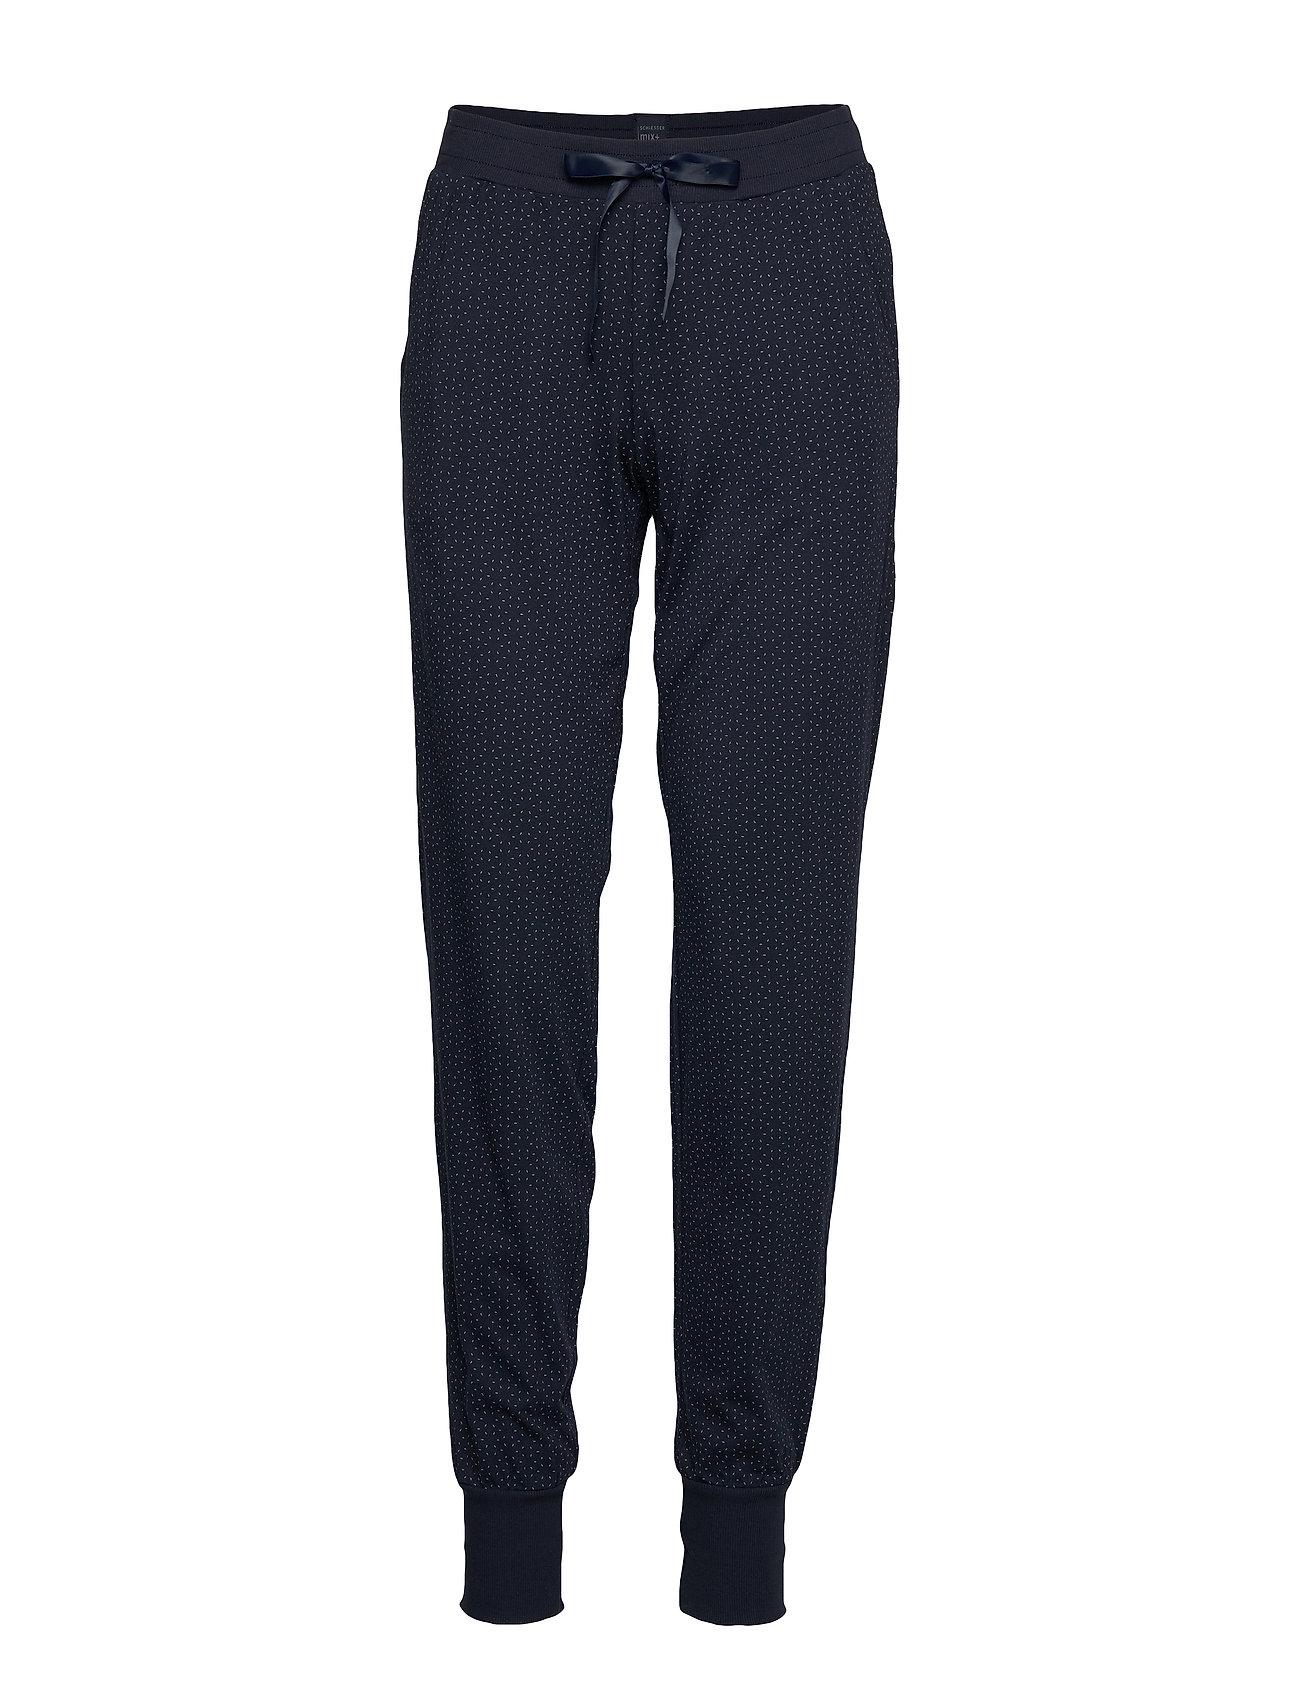 Schiesser Long Pants - NIGHTBLUE